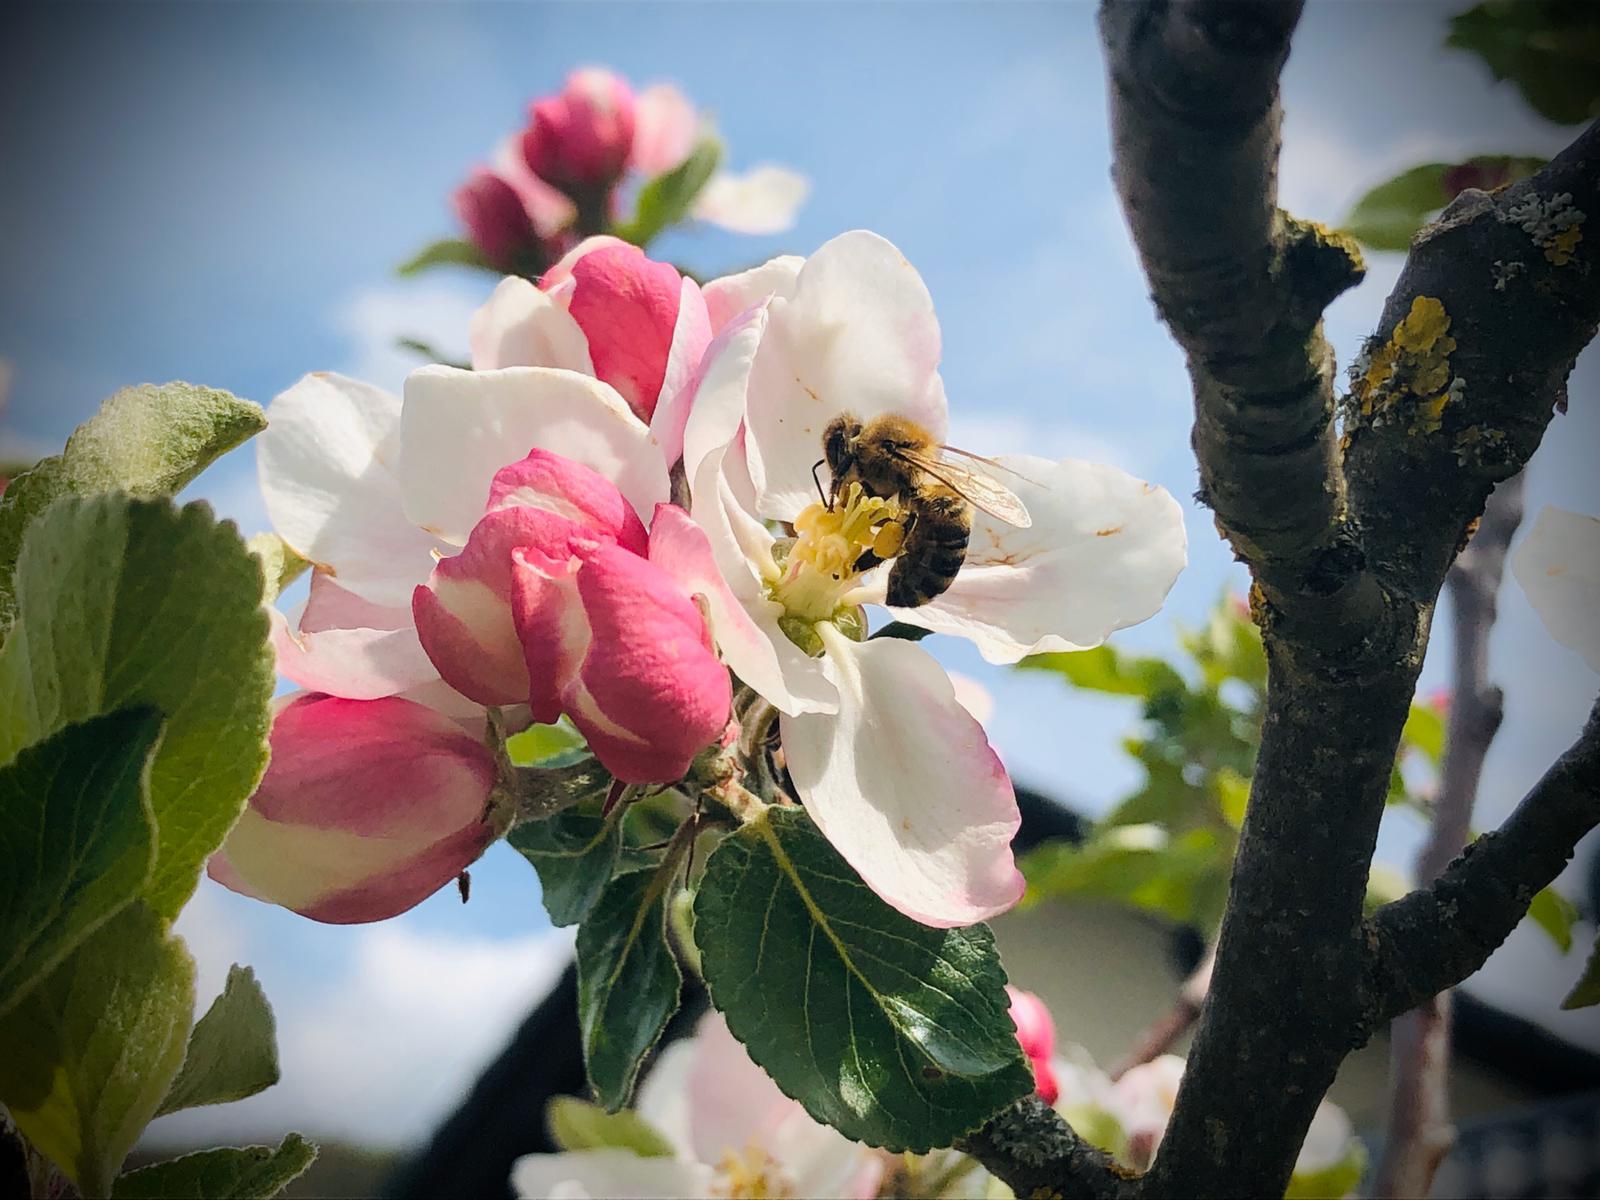 Honigbiene in der Apfelblüte